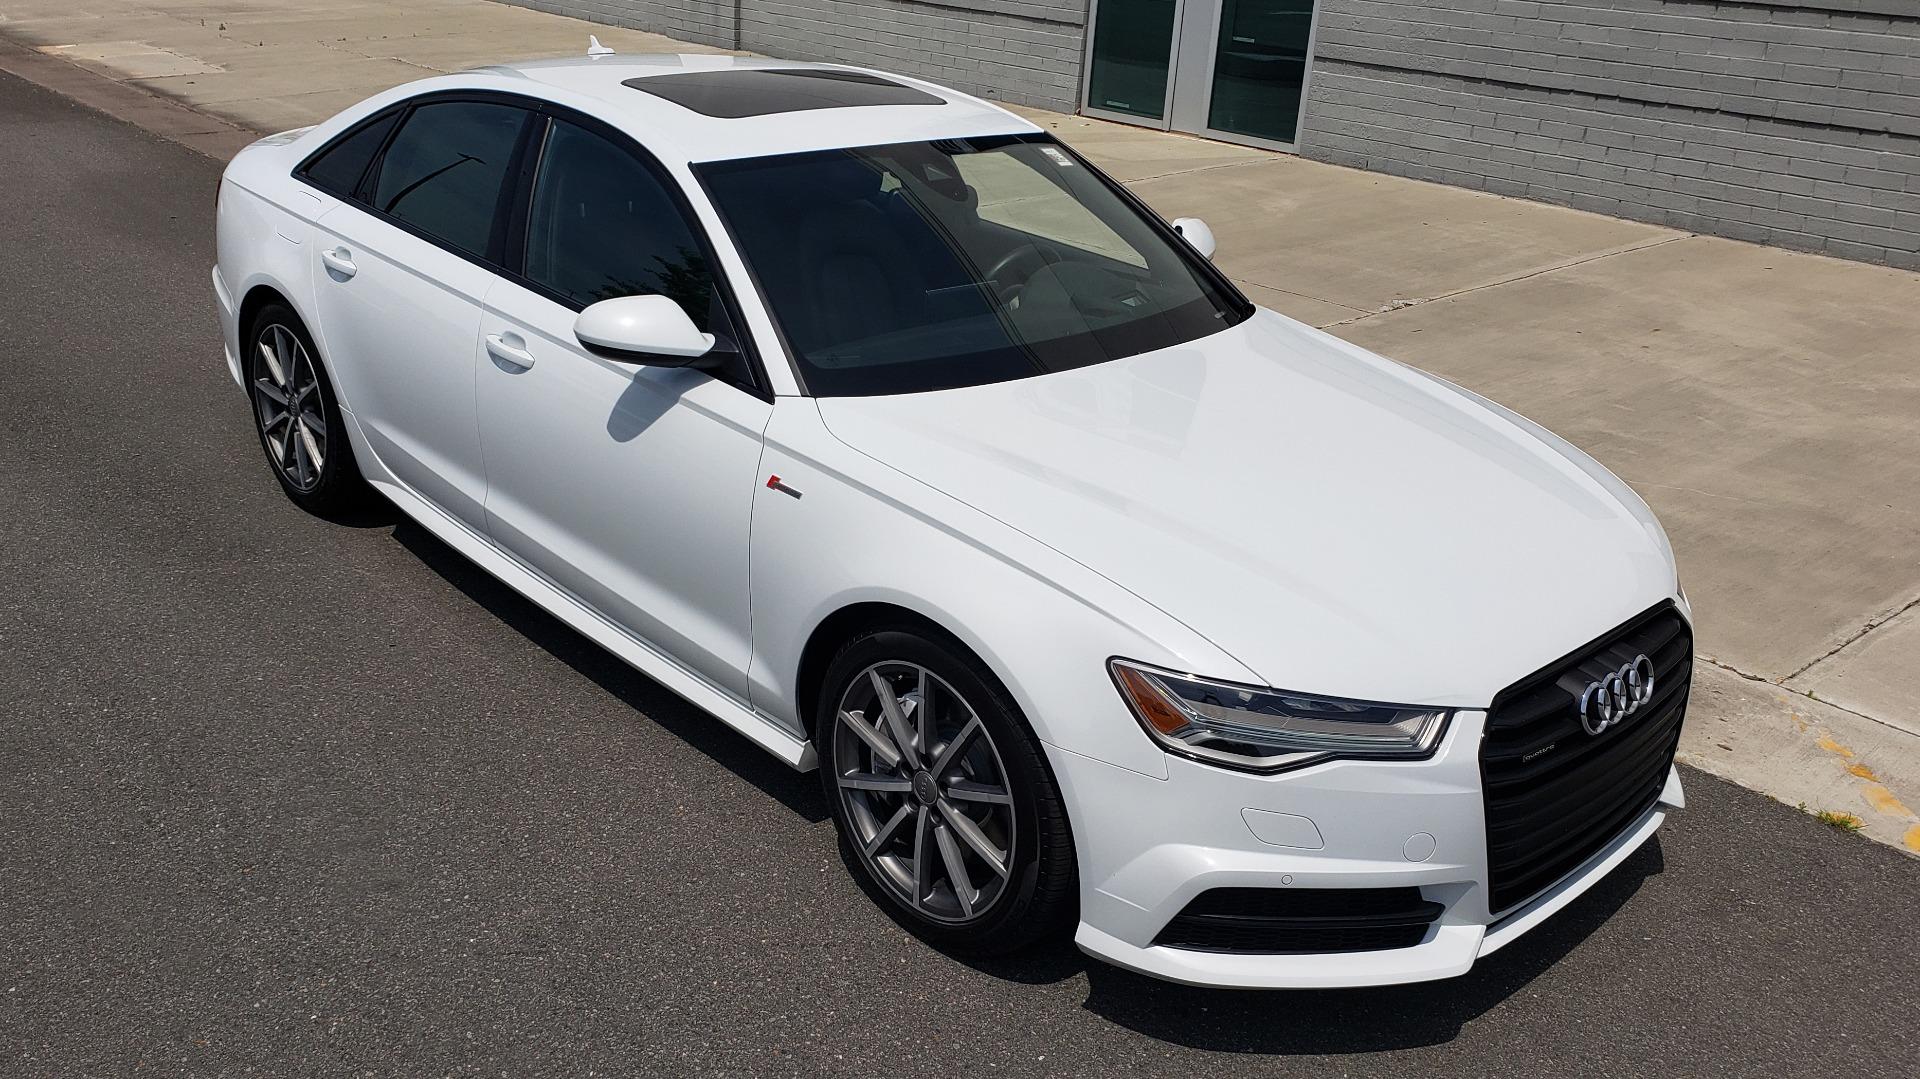 Used 2017 Audi A6 PRESTIGE SEDAN 3.0T / NAV / SUNROOF / BLACK OPTIC / CLD WTHR / REARVIEW for sale $30,797 at Formula Imports in Charlotte NC 28227 8